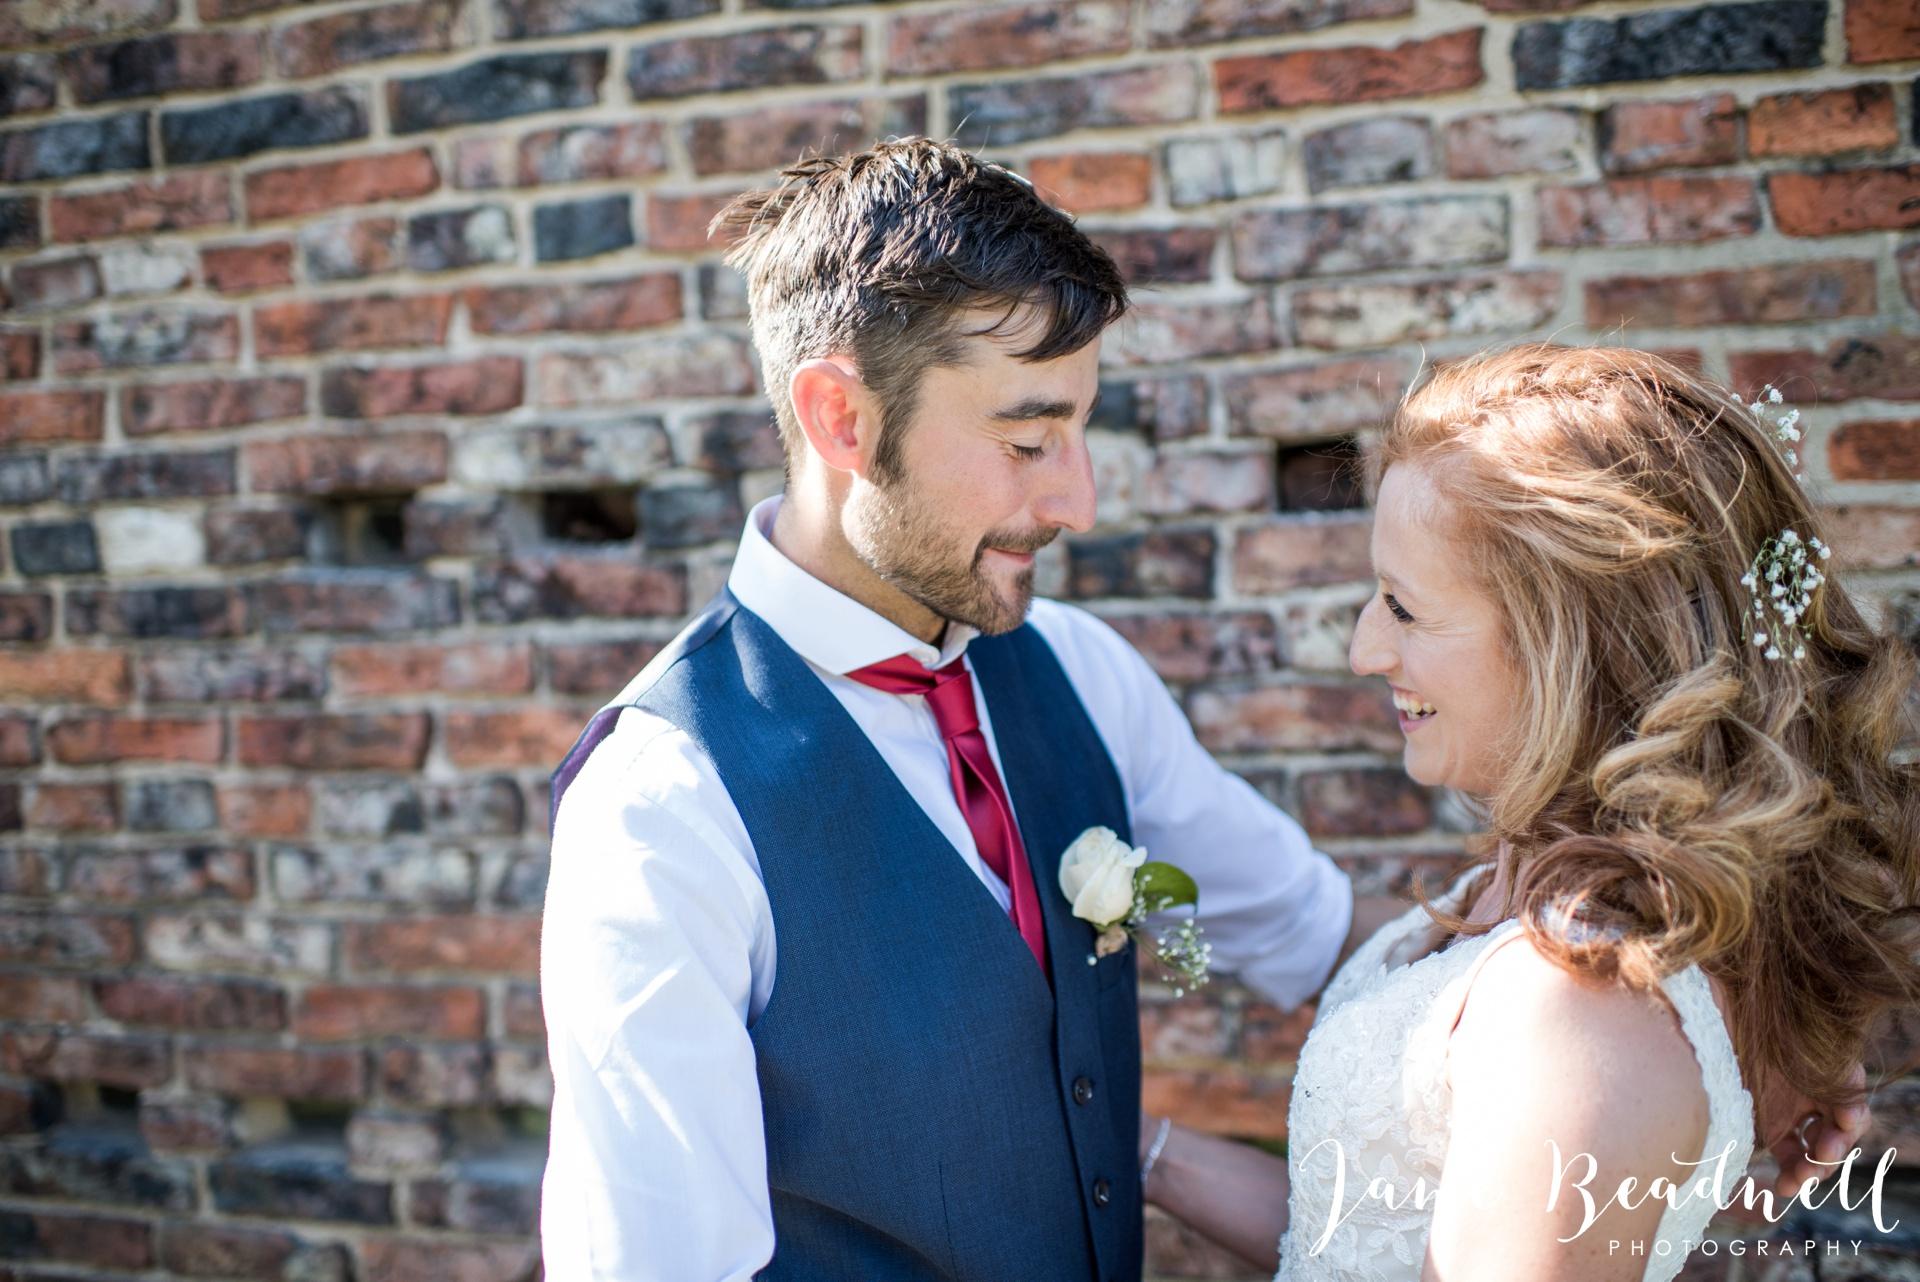 yorkshire-fine-art-wedding-photographer-jane-beadnell-photography-poppleton-york_0115